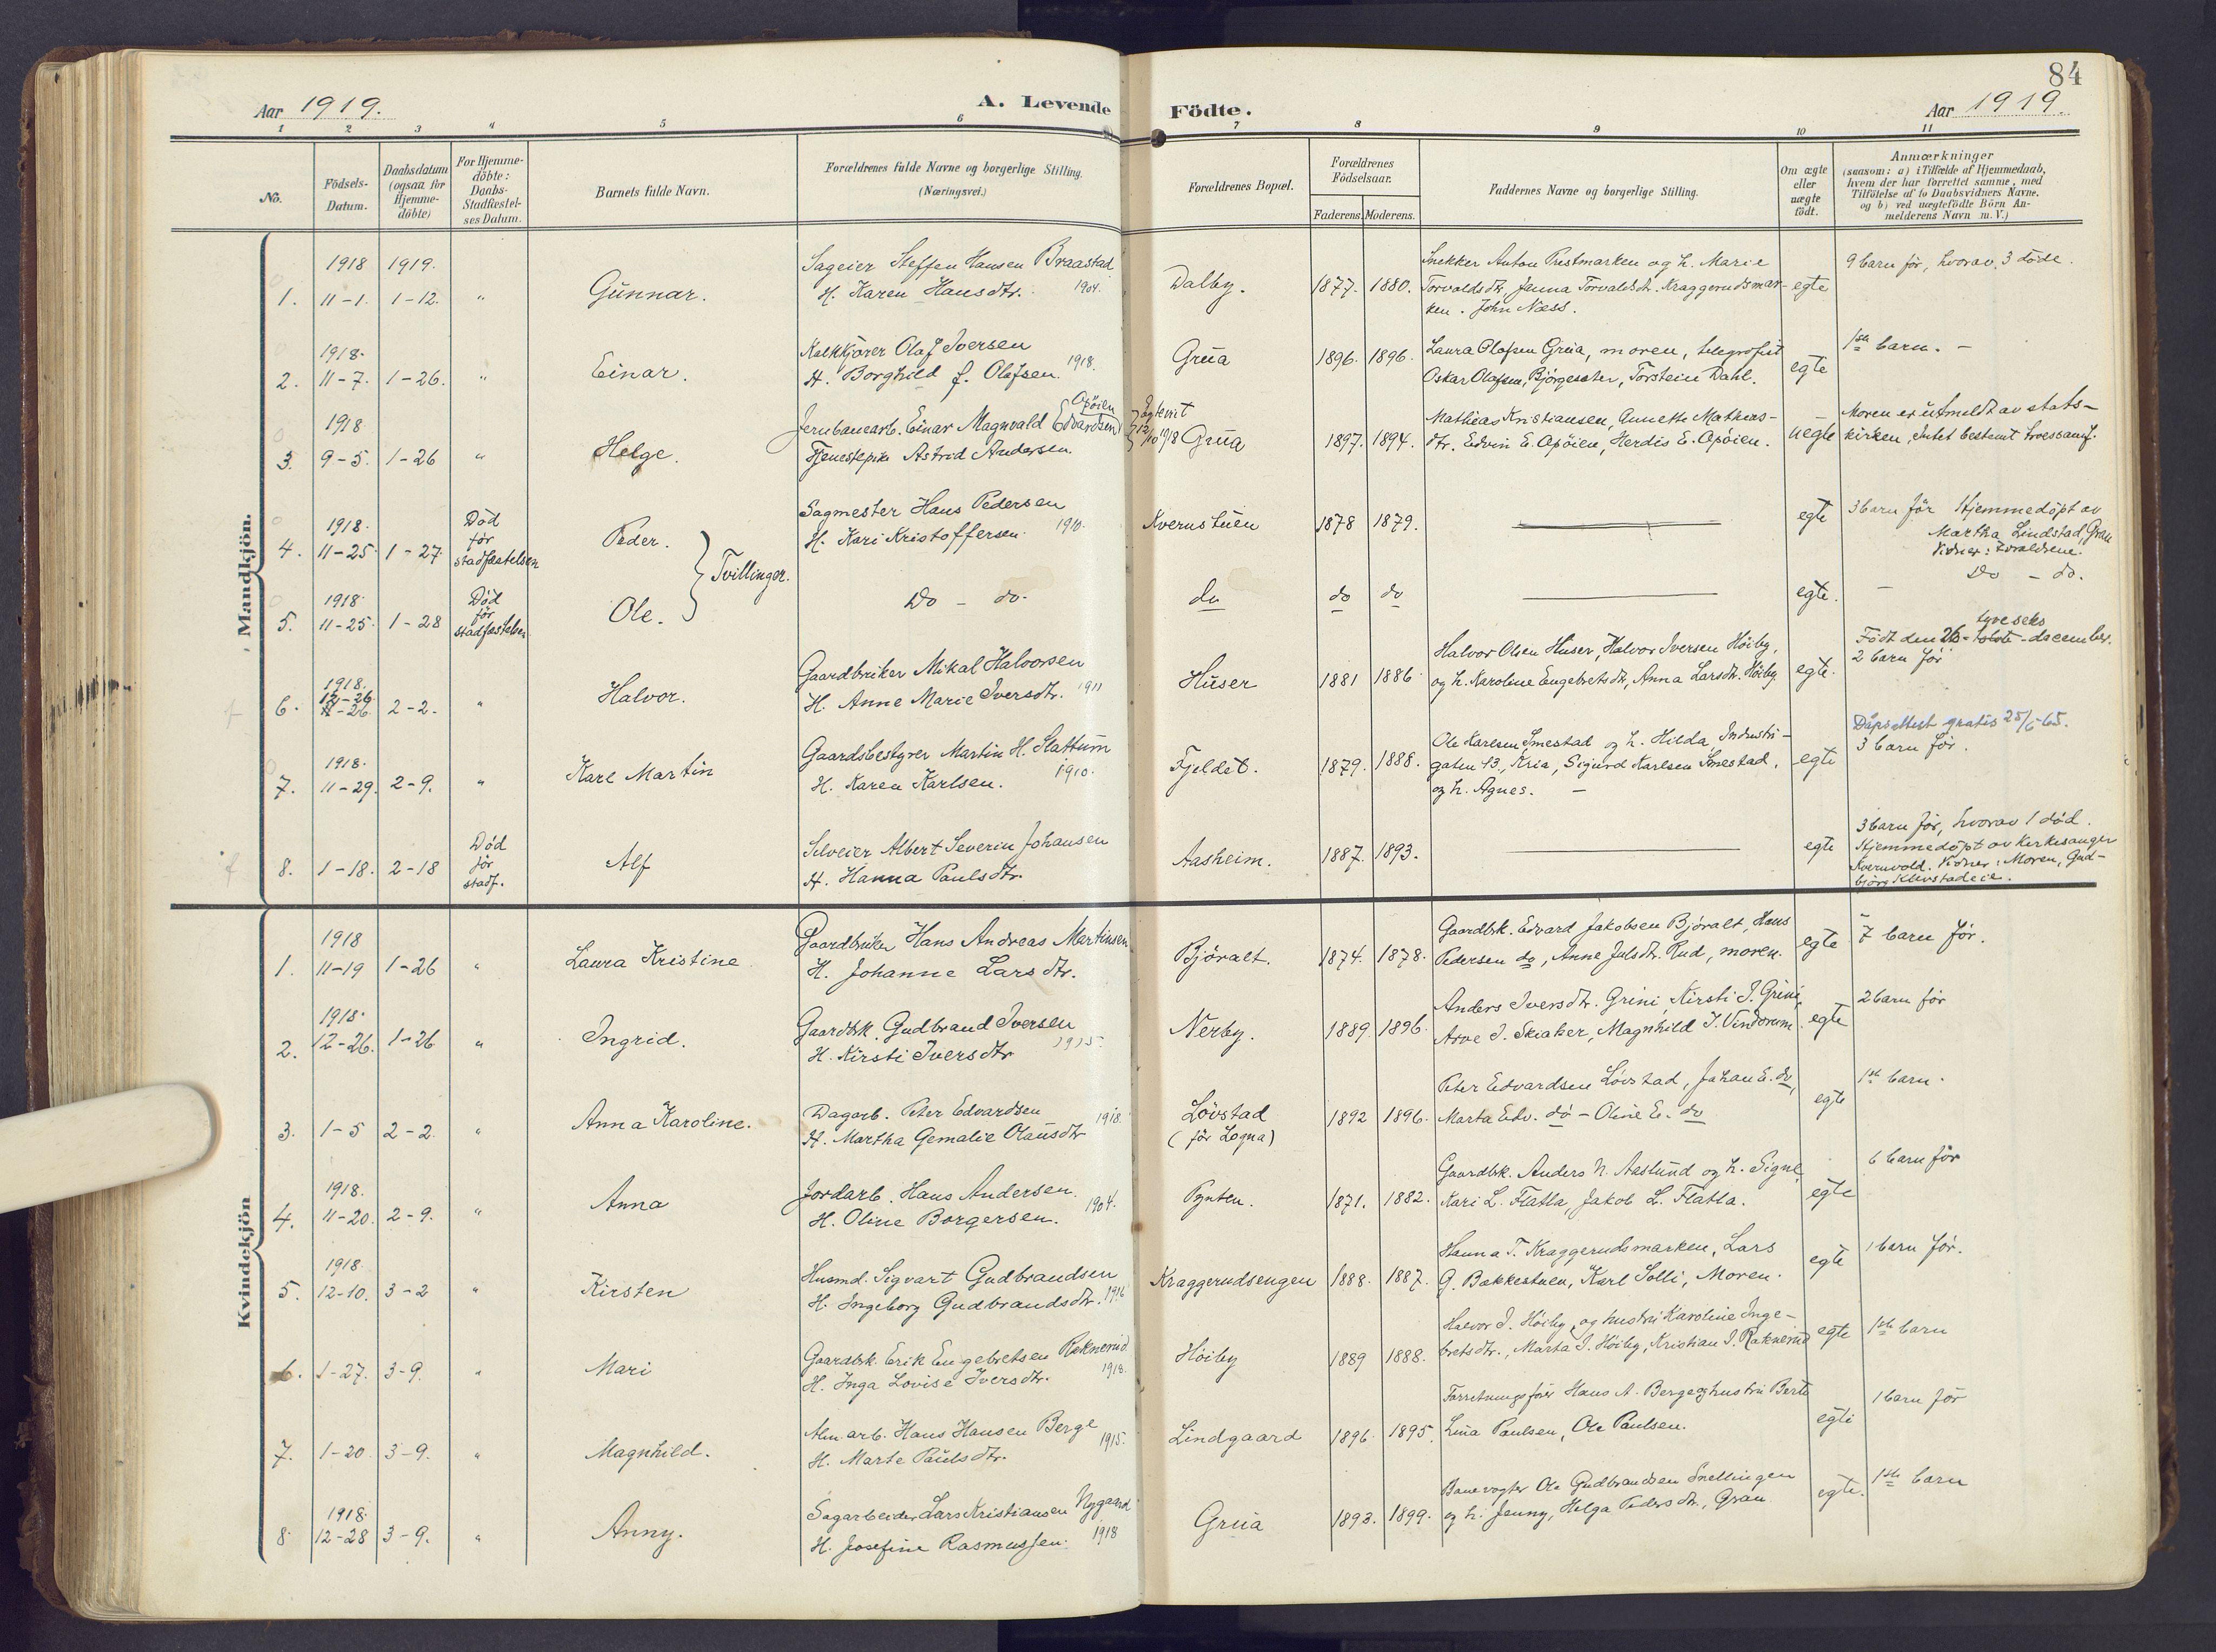 SAH, Lunner prestekontor, H/Ha/Haa/L0001: Ministerialbok nr. 1, 1907-1922, s. 84